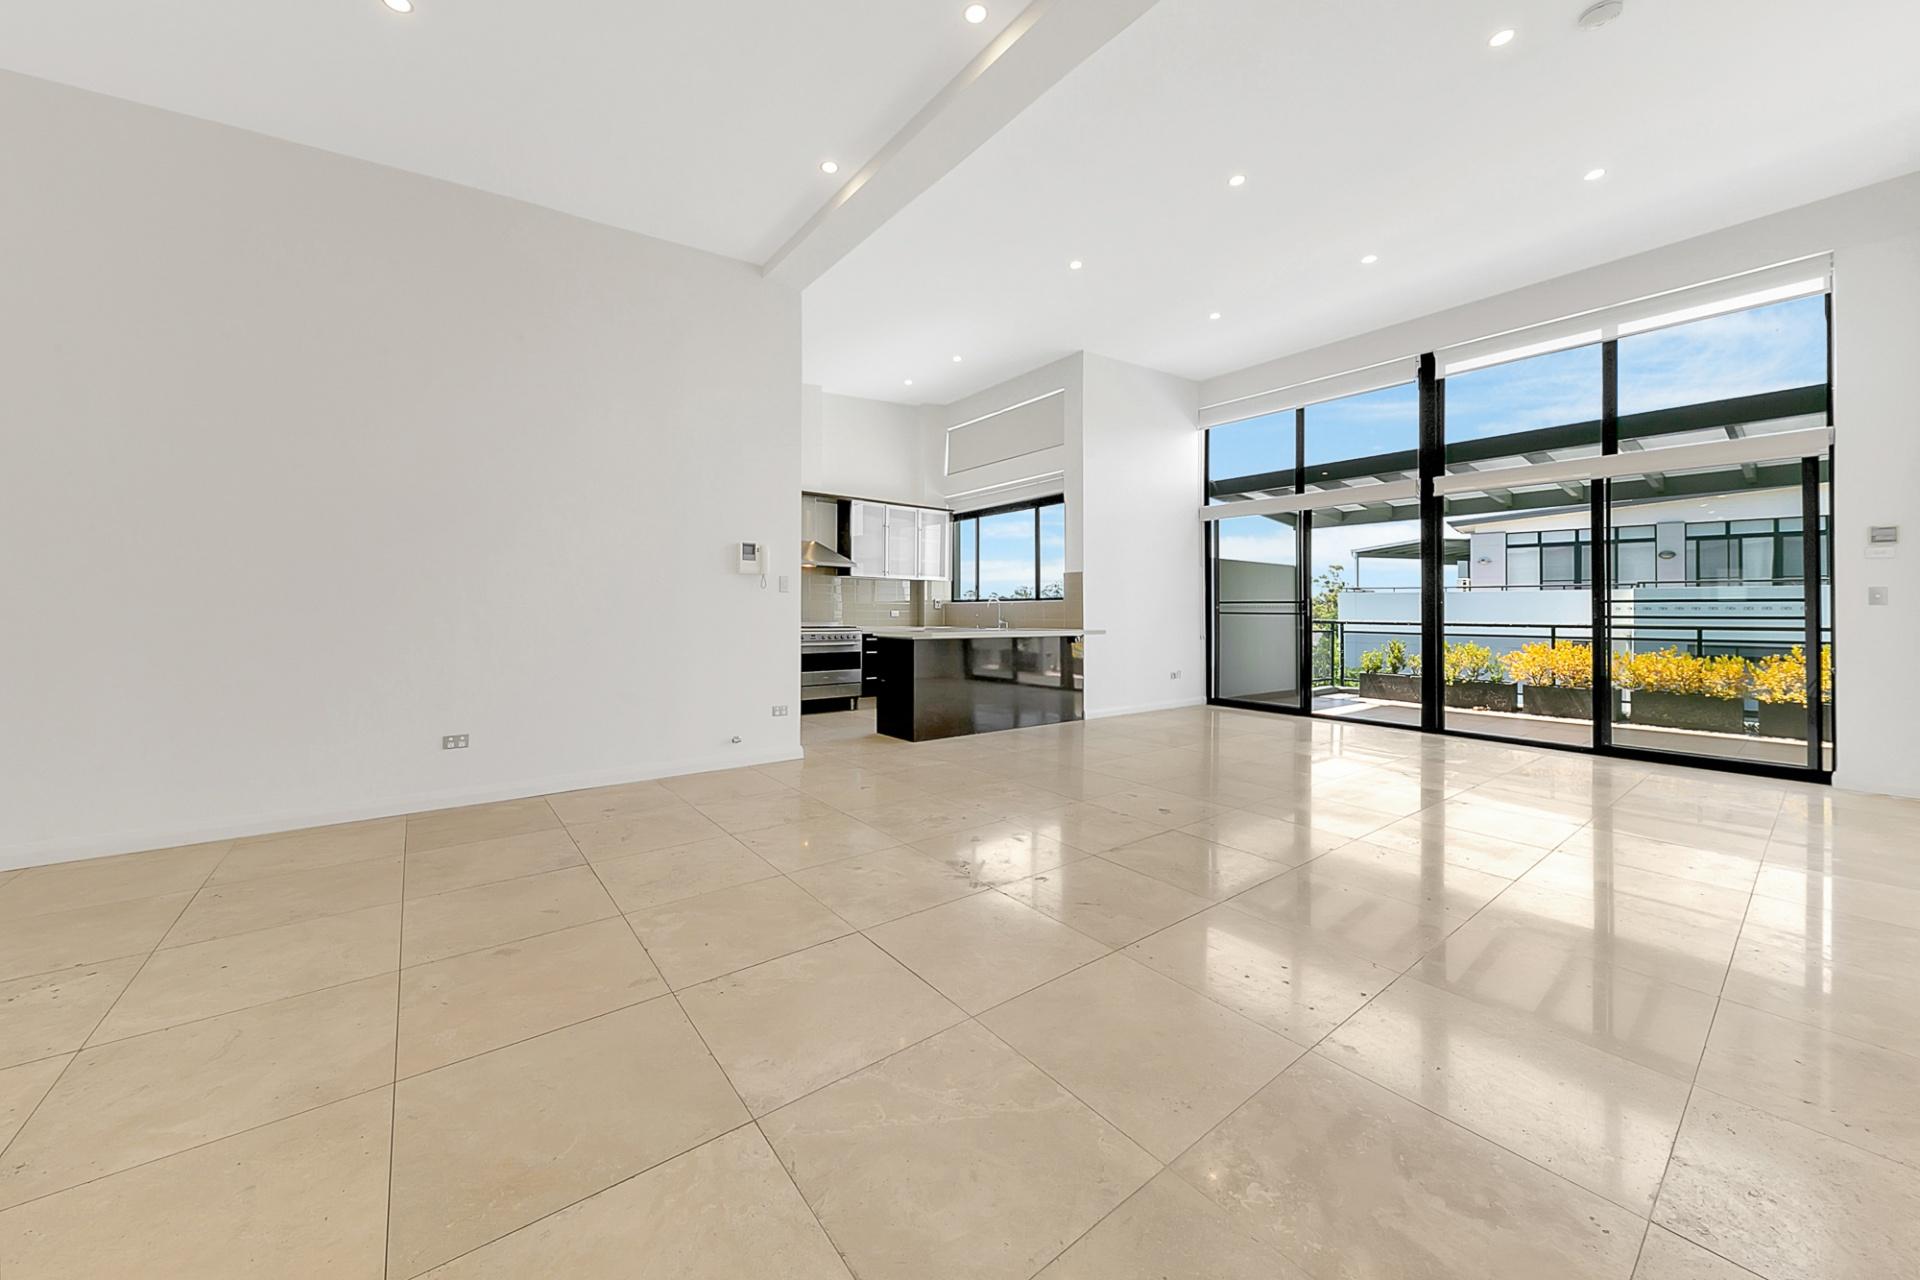 2 Bedrooms, Apartment, Leased, Purser Avenue, 2 Bathrooms, Listing ID 1354, Castle Hill, NSW, Australia,